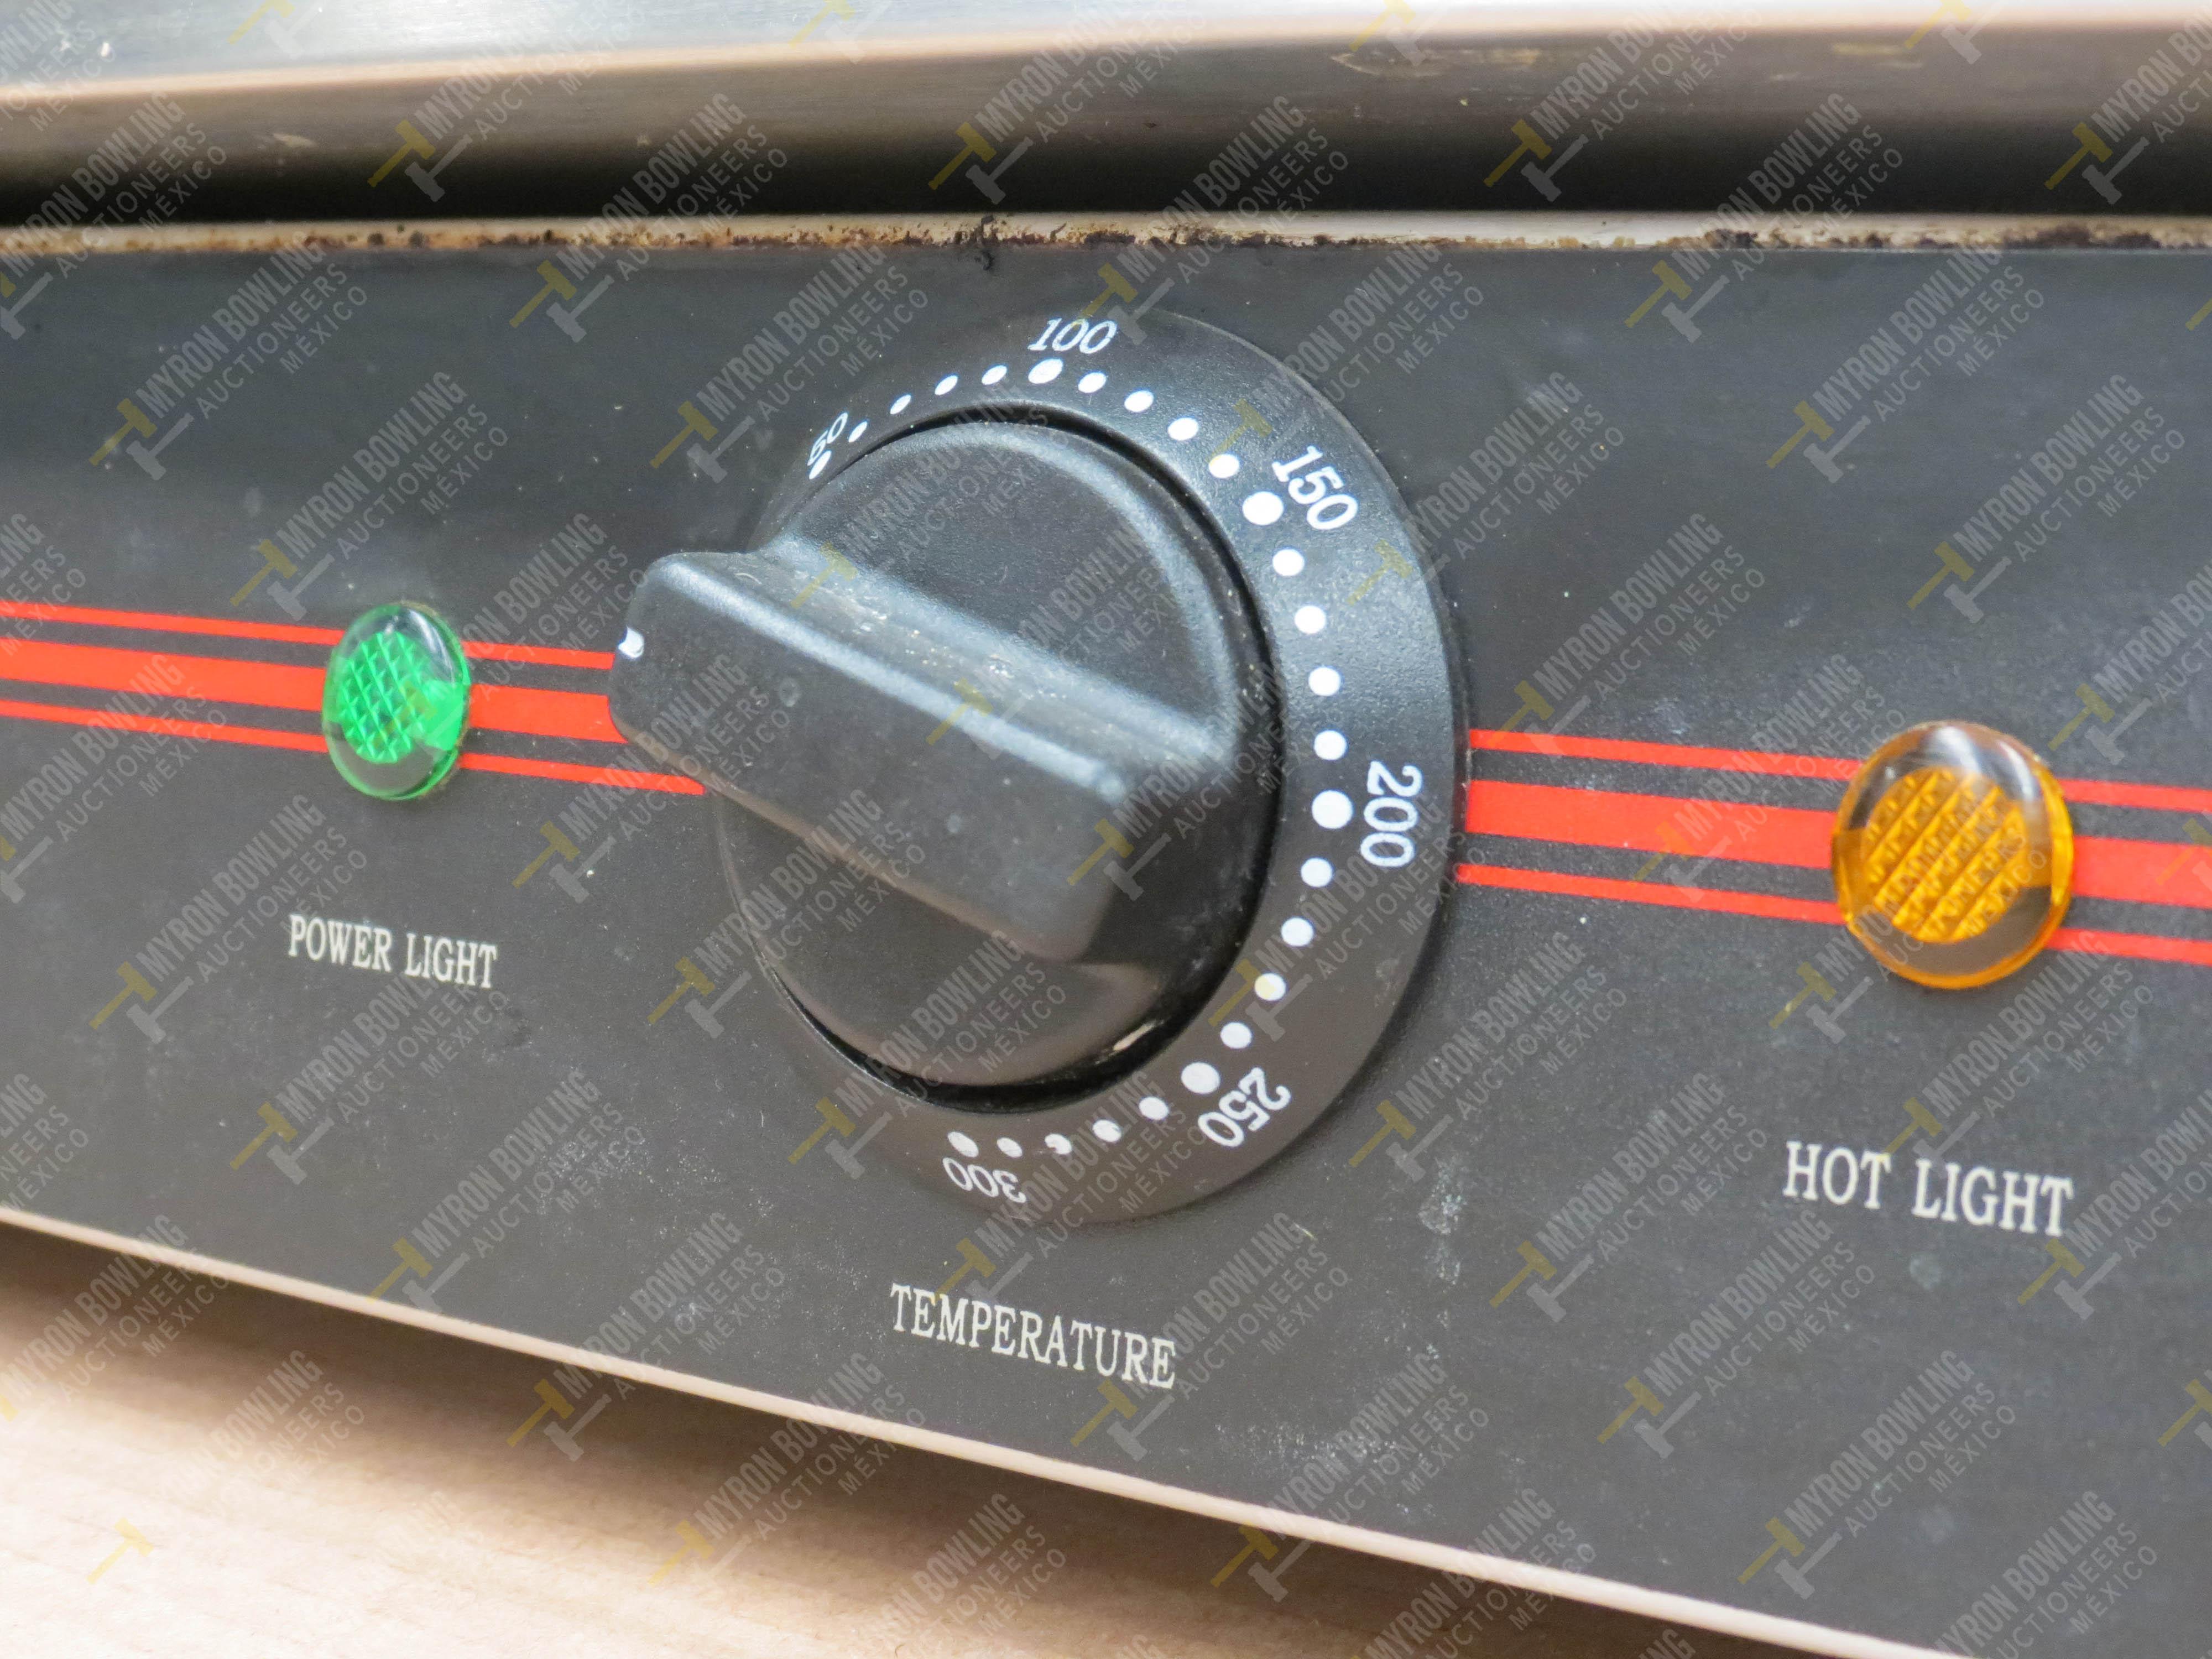 Parrilla eléctrica marca Drago, Modelo Double, No. de Serie 60081029082